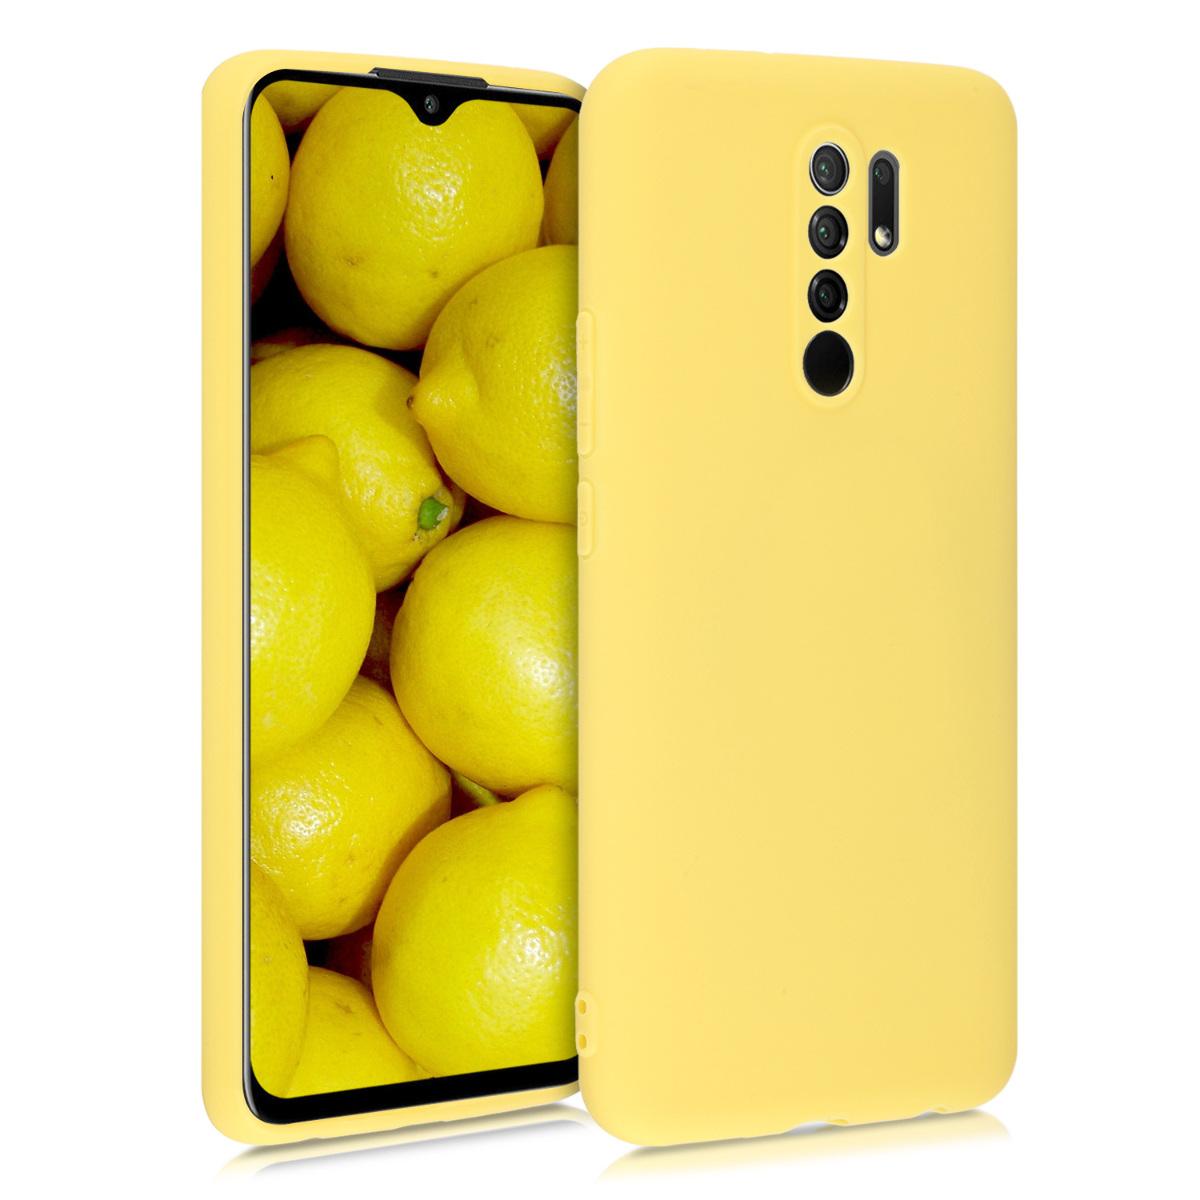 Kvalitní silikonové TPU pouzdro | obal pro Xiaomi Redmi 9 - žluté matný